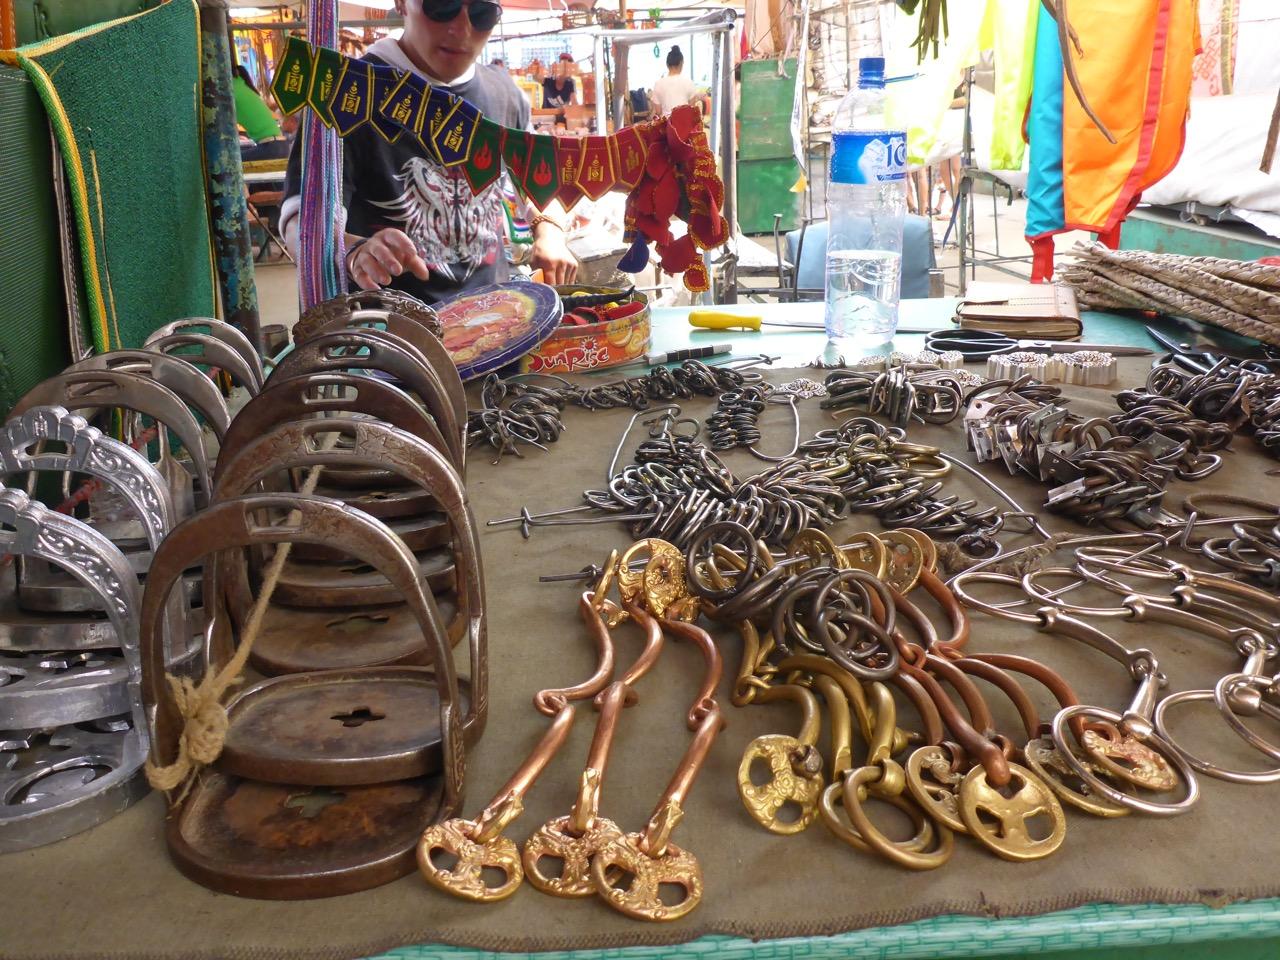 Tack at the black market in UlaanBataar